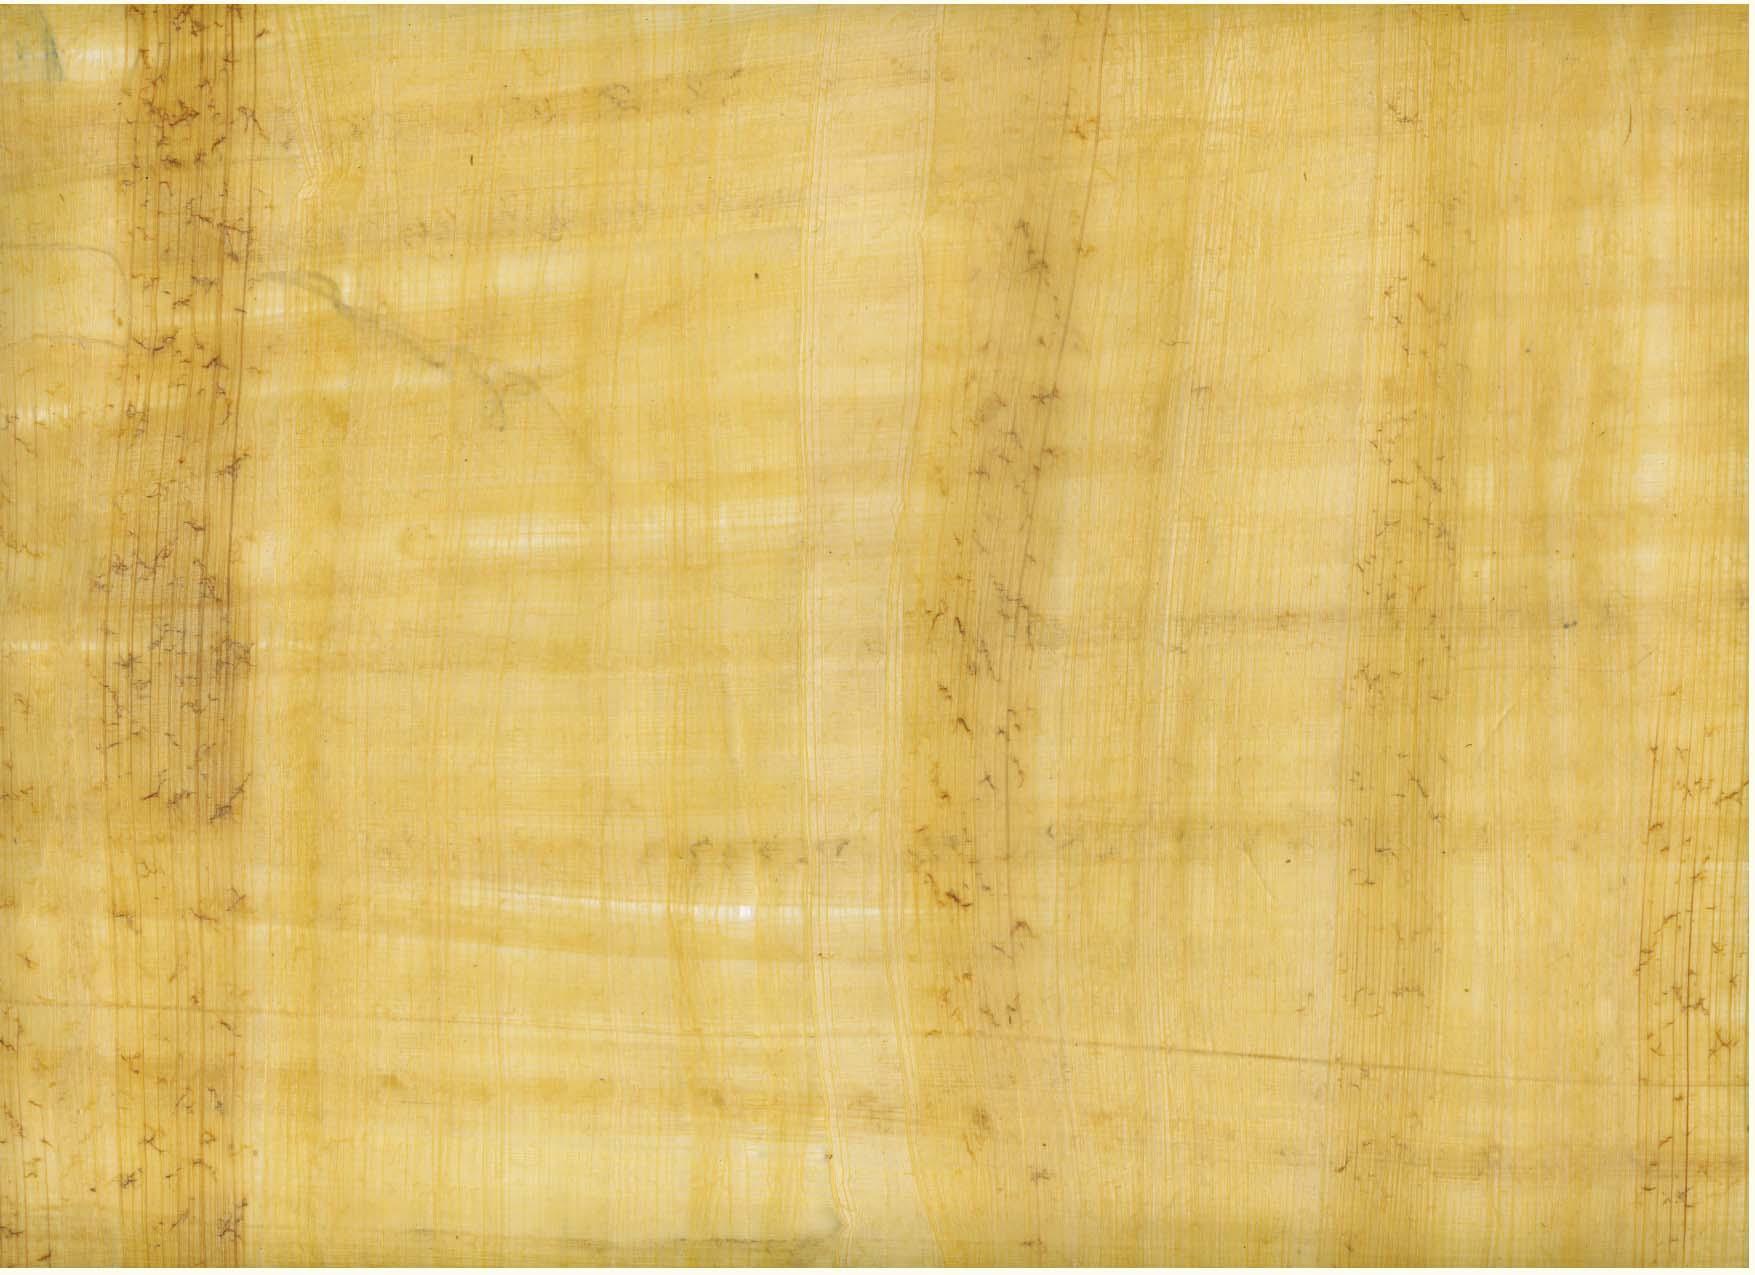 papyrus wallpaper wallpapersafari. Black Bedroom Furniture Sets. Home Design Ideas